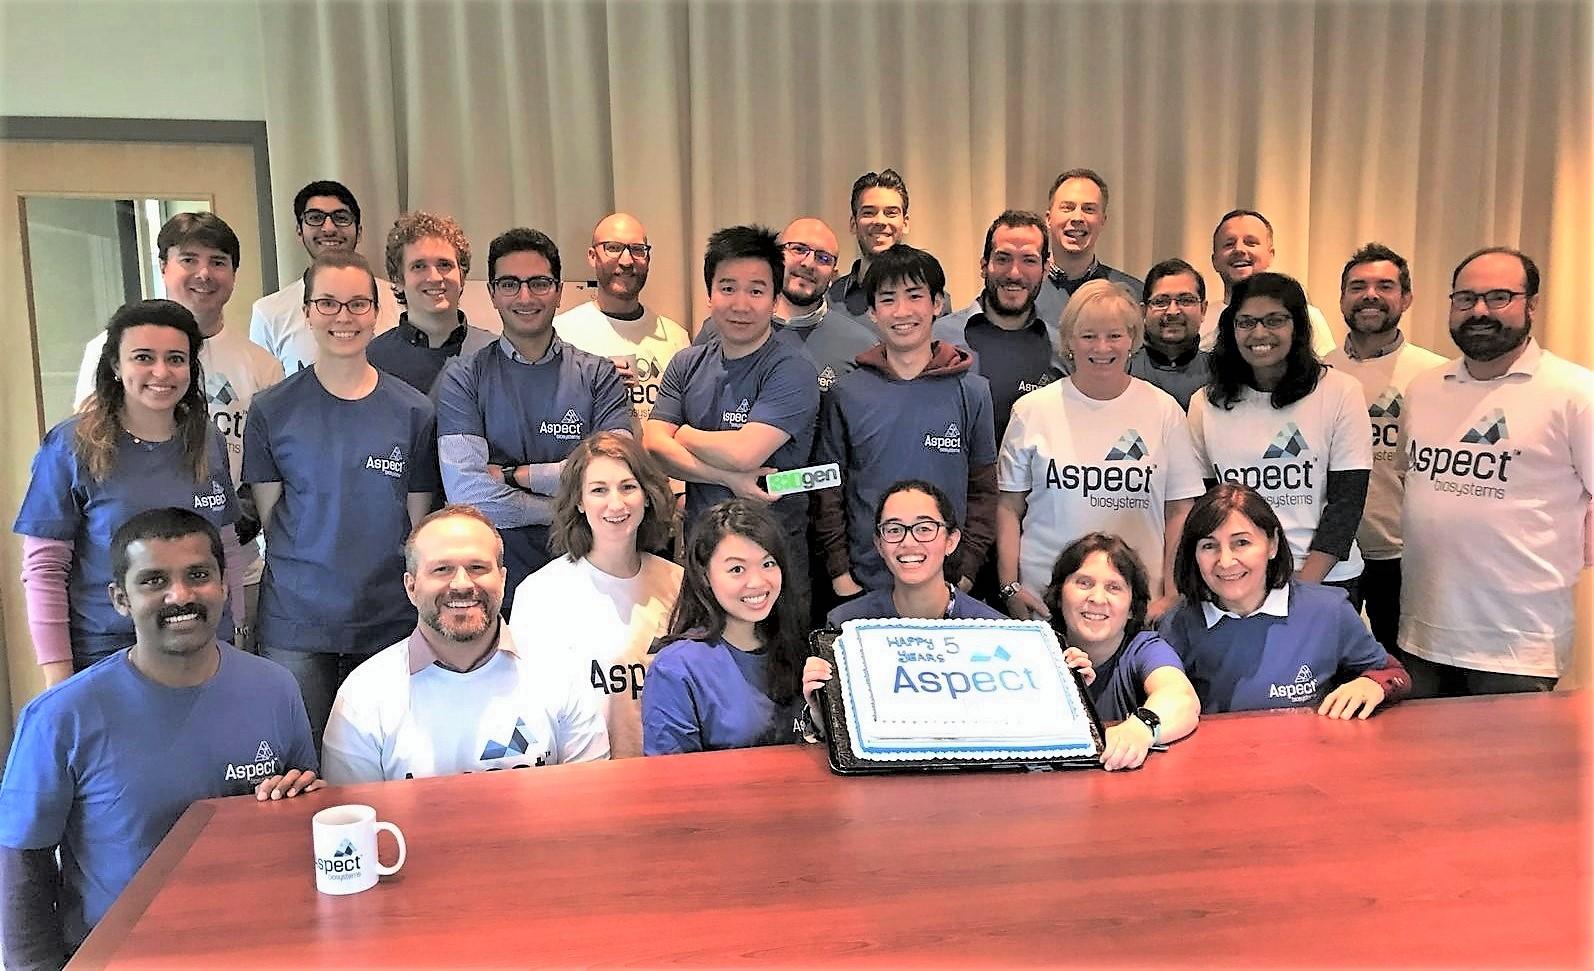 Aspect Biosystems' Team